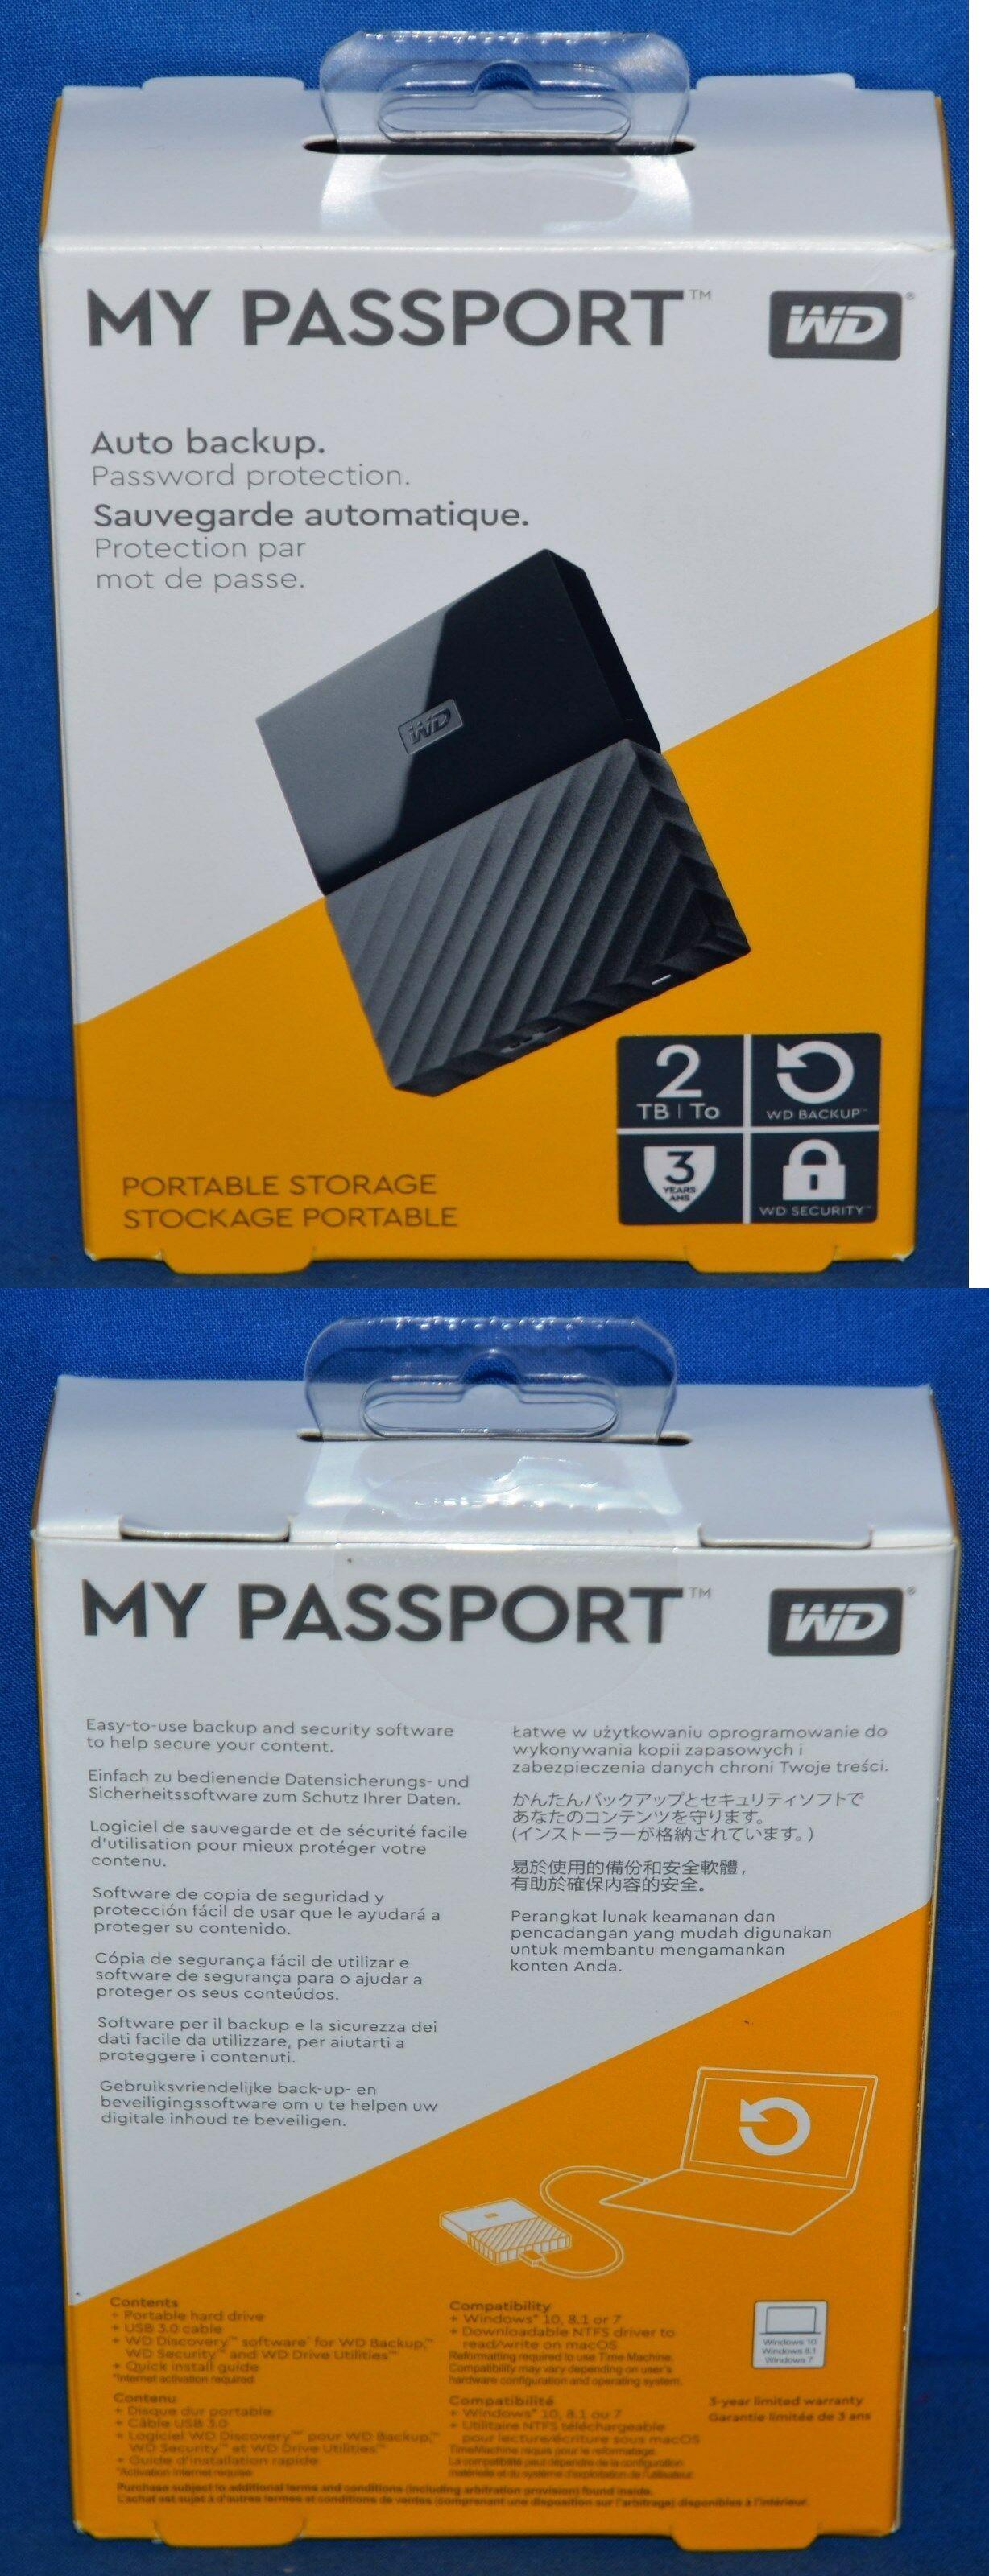 External Hard Disk Drives 131553: Wd 2Tb My Passport Portable